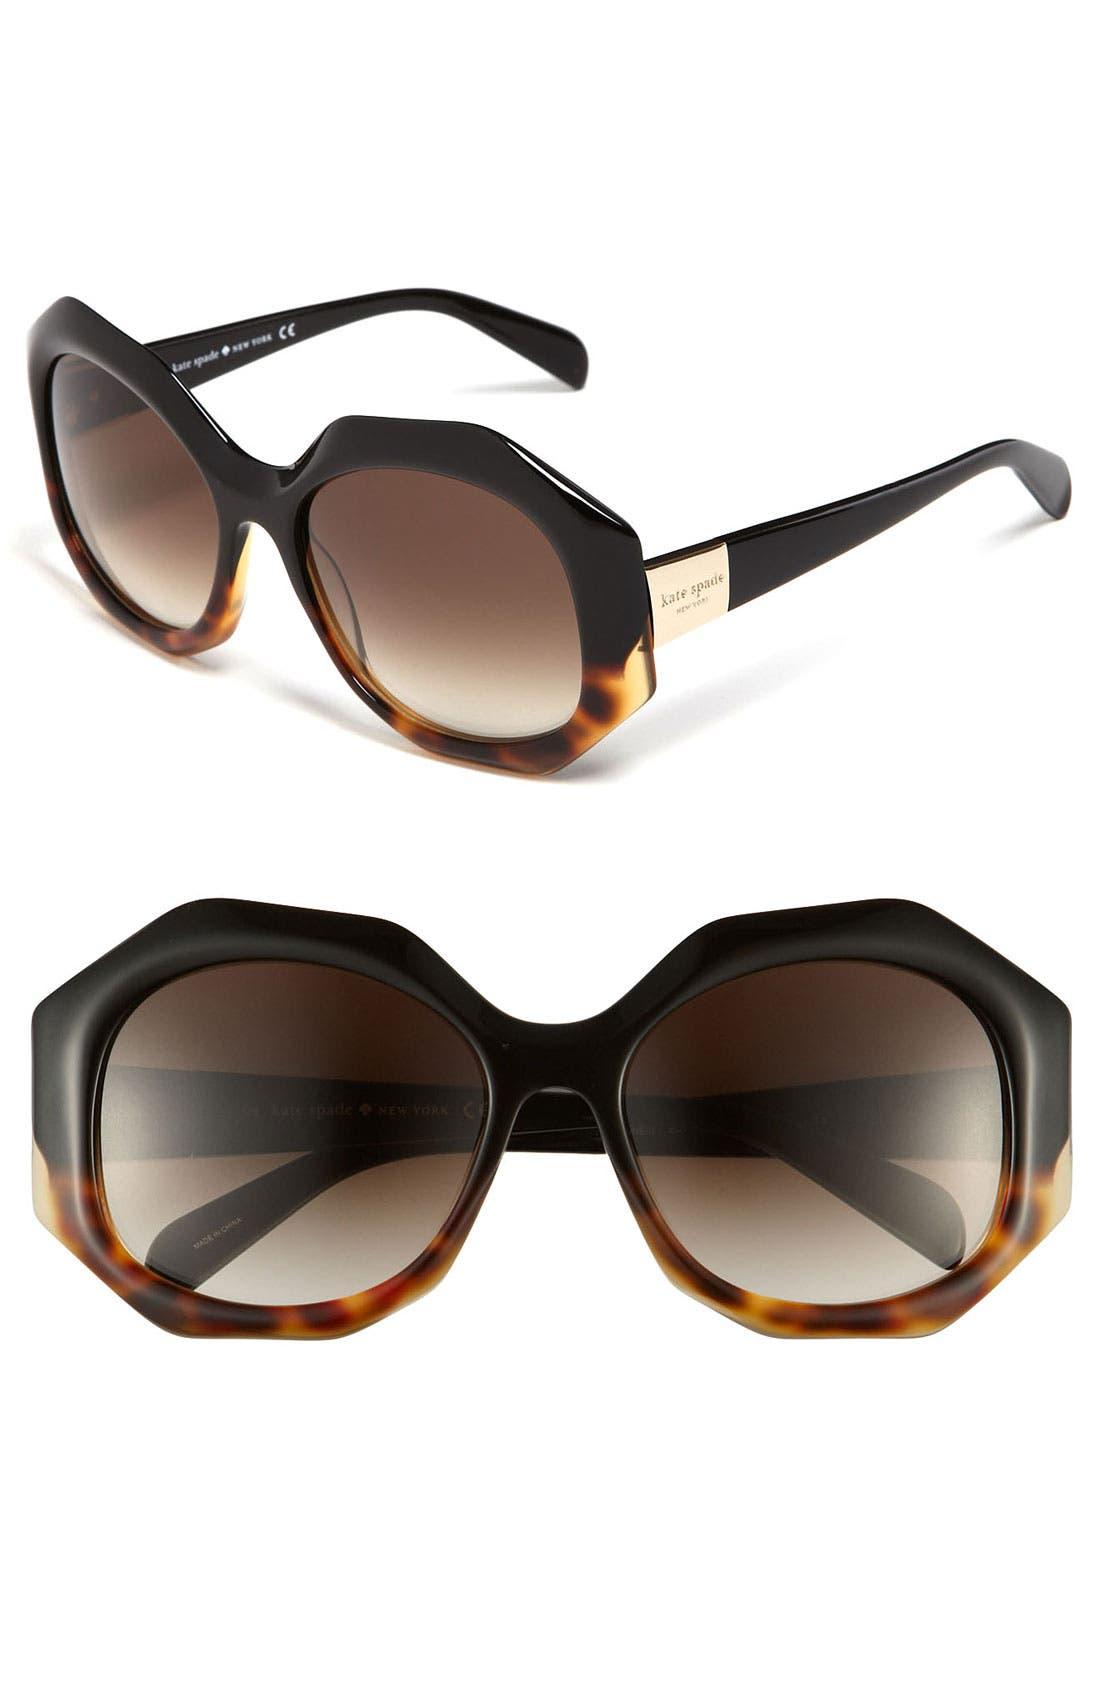 Alternate Image 1 Selected - kate spade new york Oversized retro sunglasses